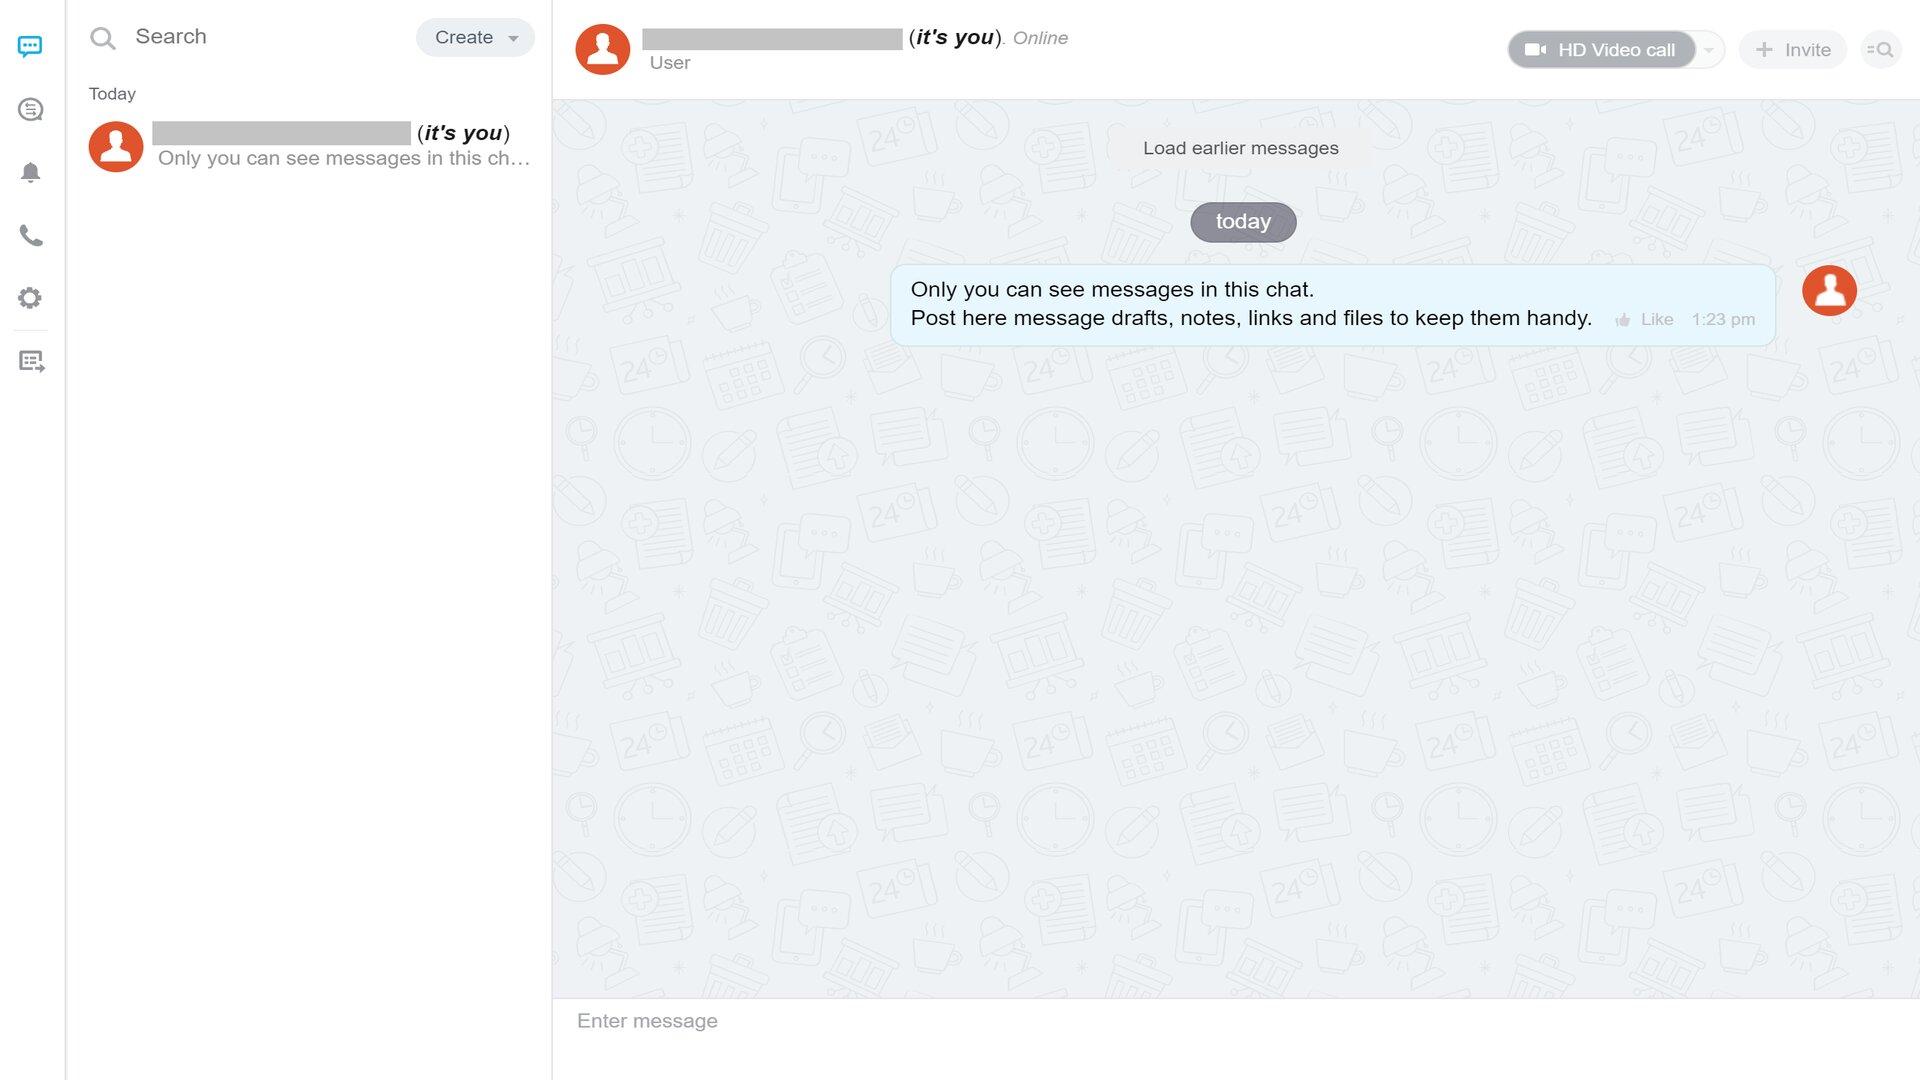 Bitrix24's chat service